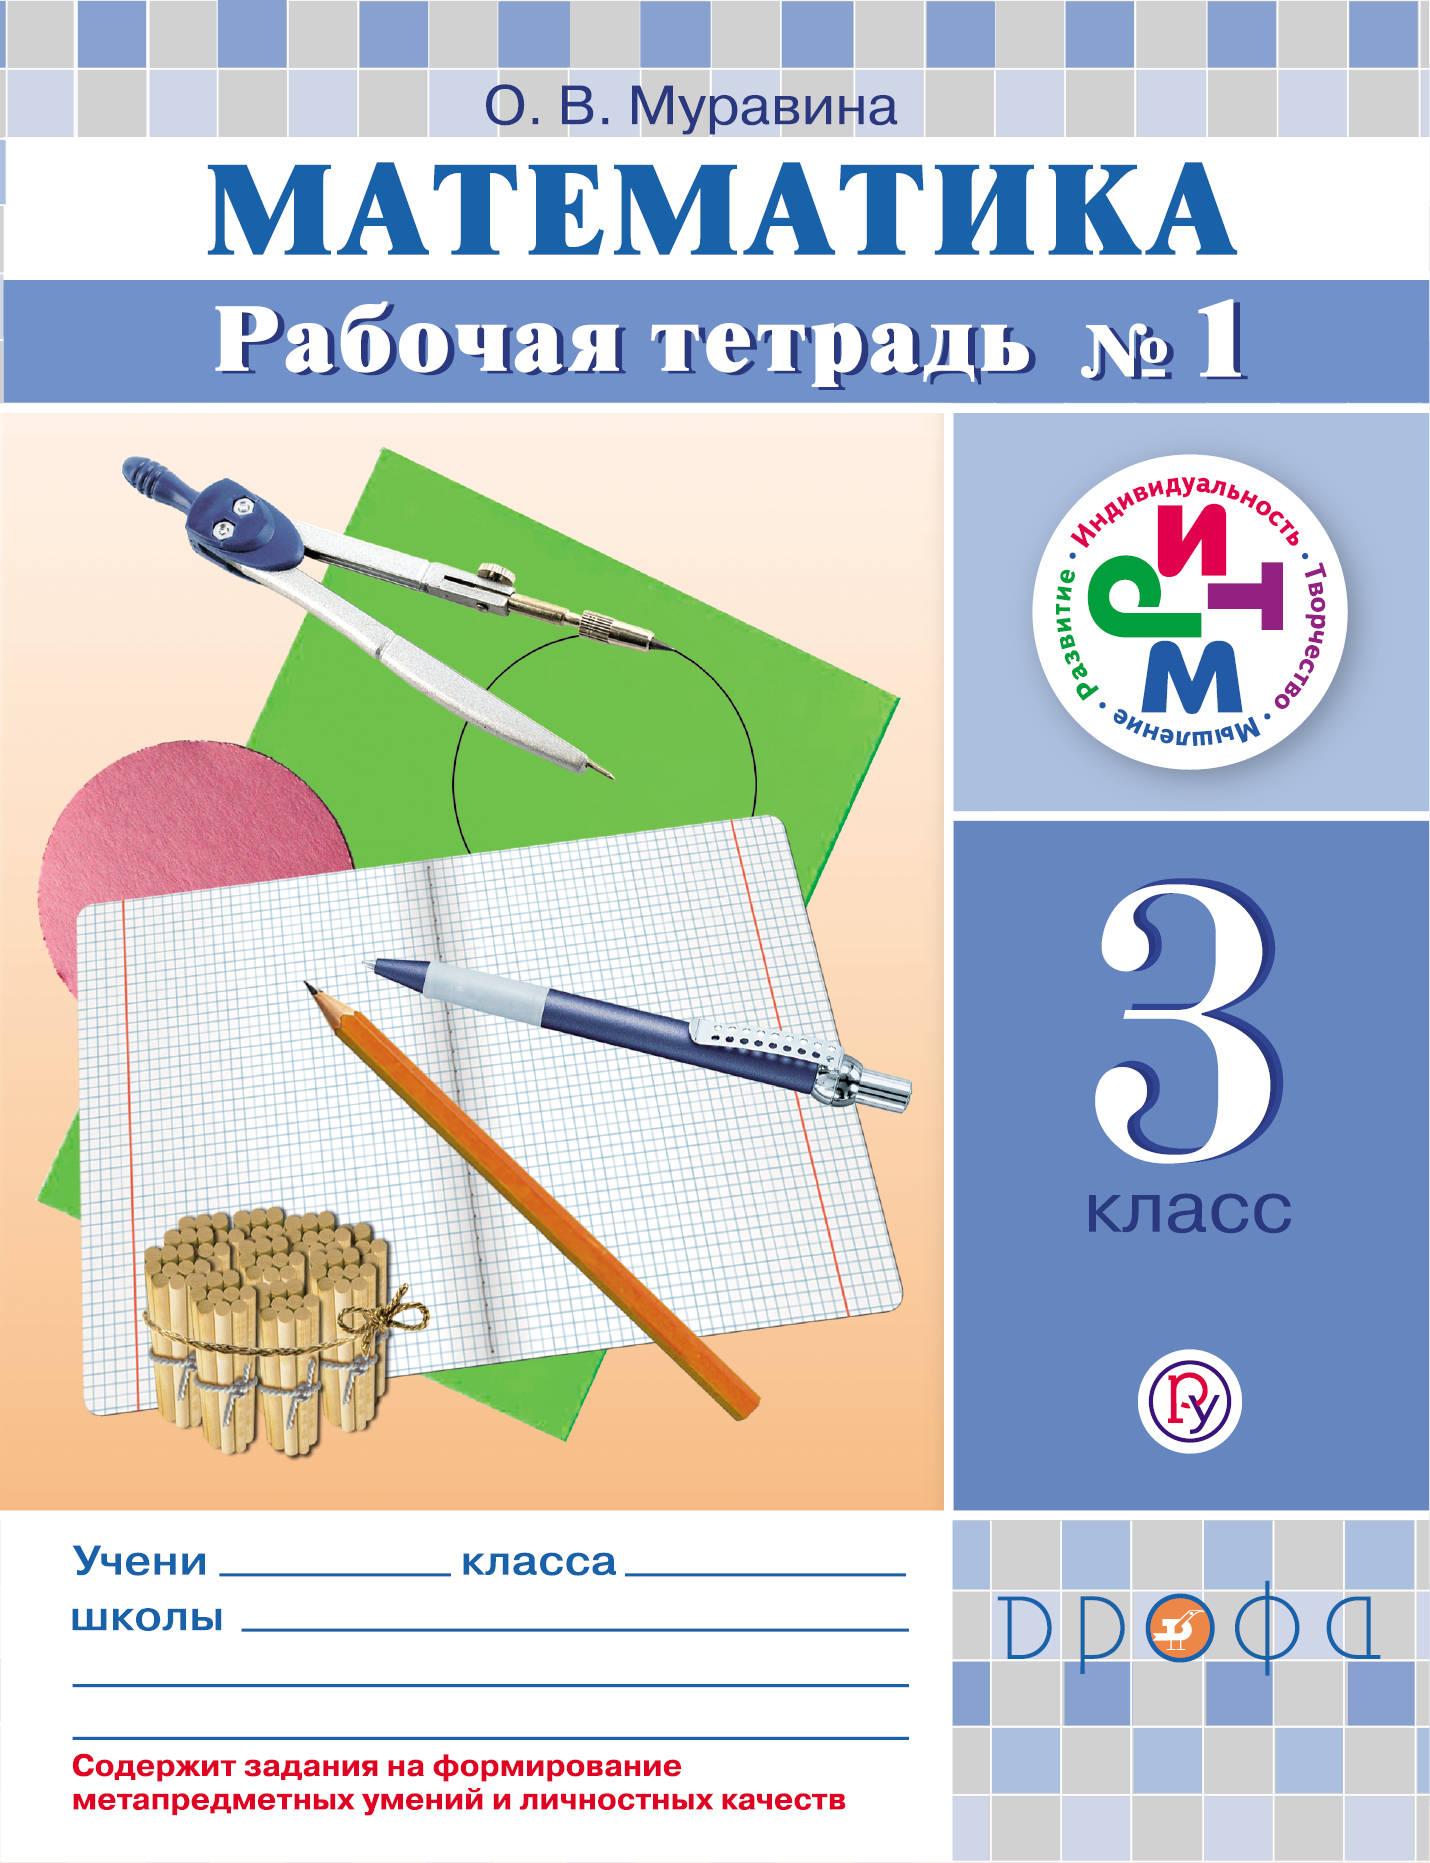 Математика. 3 кл. Рабочая тетрадь. №1 РИТМ